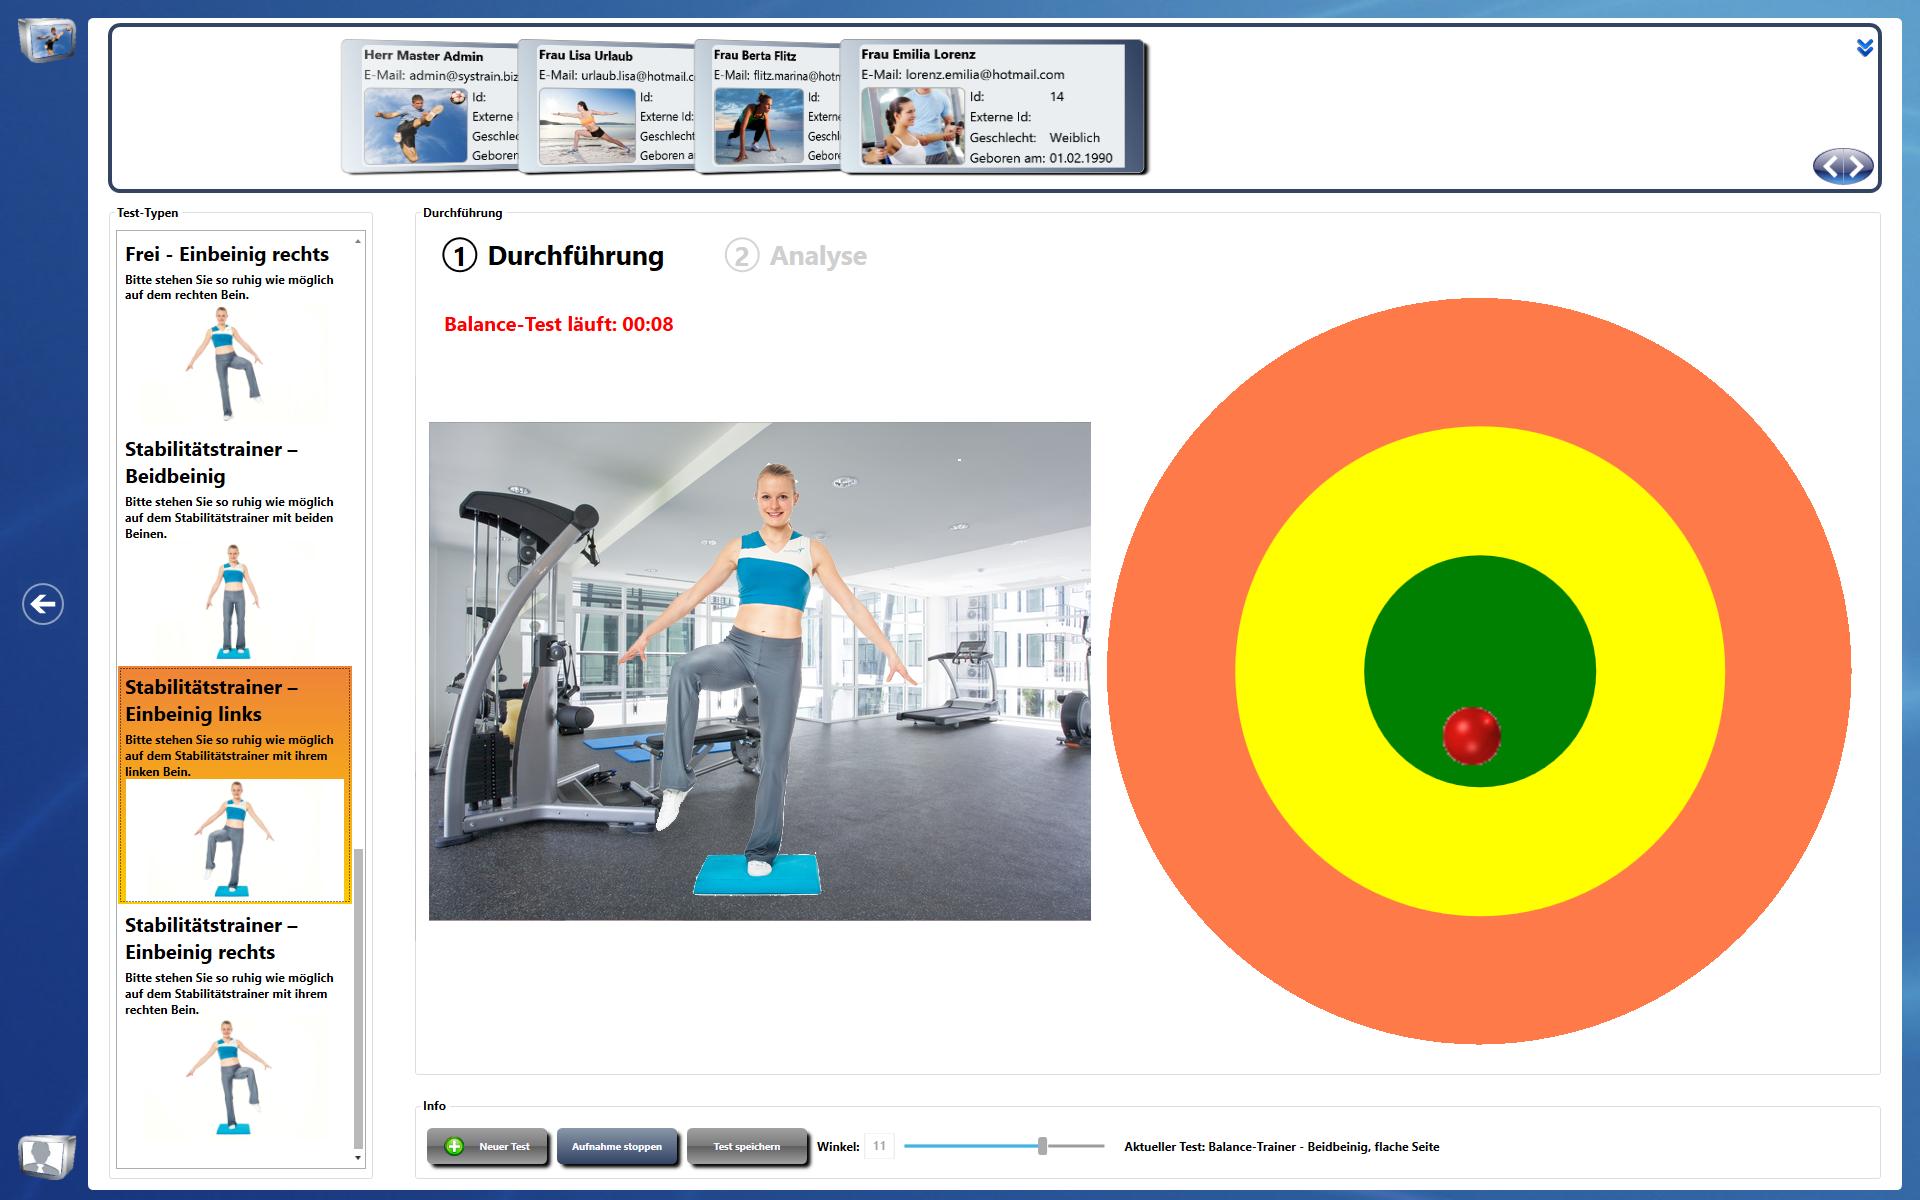 Hvac Test And Balance Form For Air Apk Downloader #018000